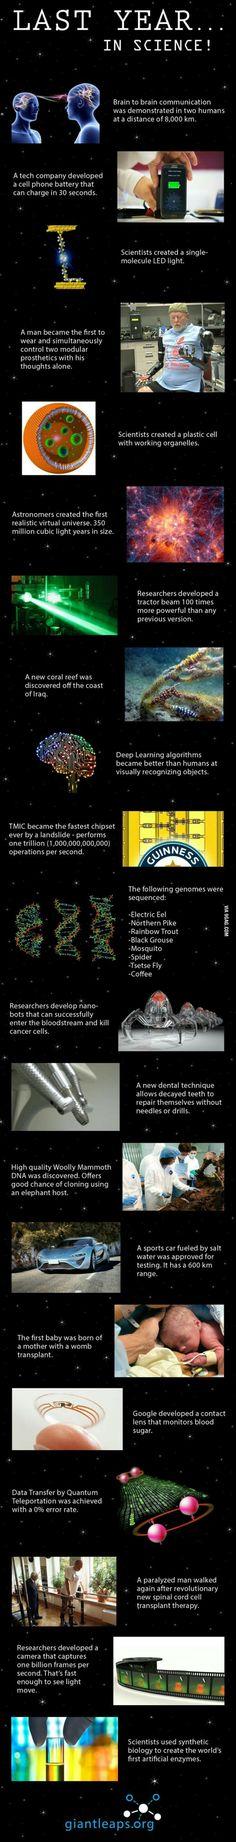 Last year scientific breakthroughs.